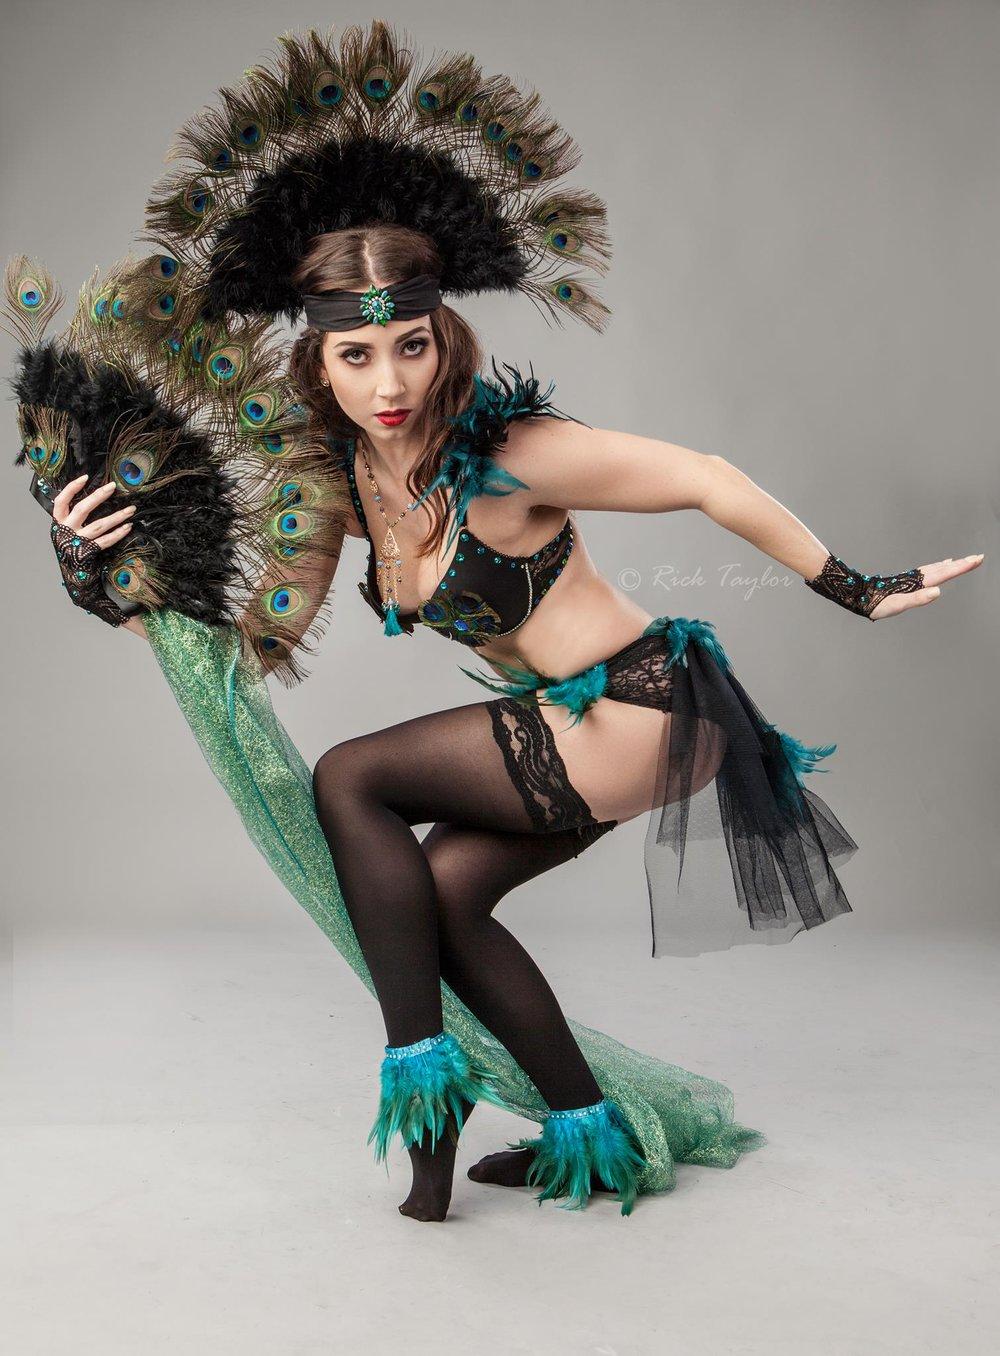 Peacock Rick Taylor Photography 14.jpg